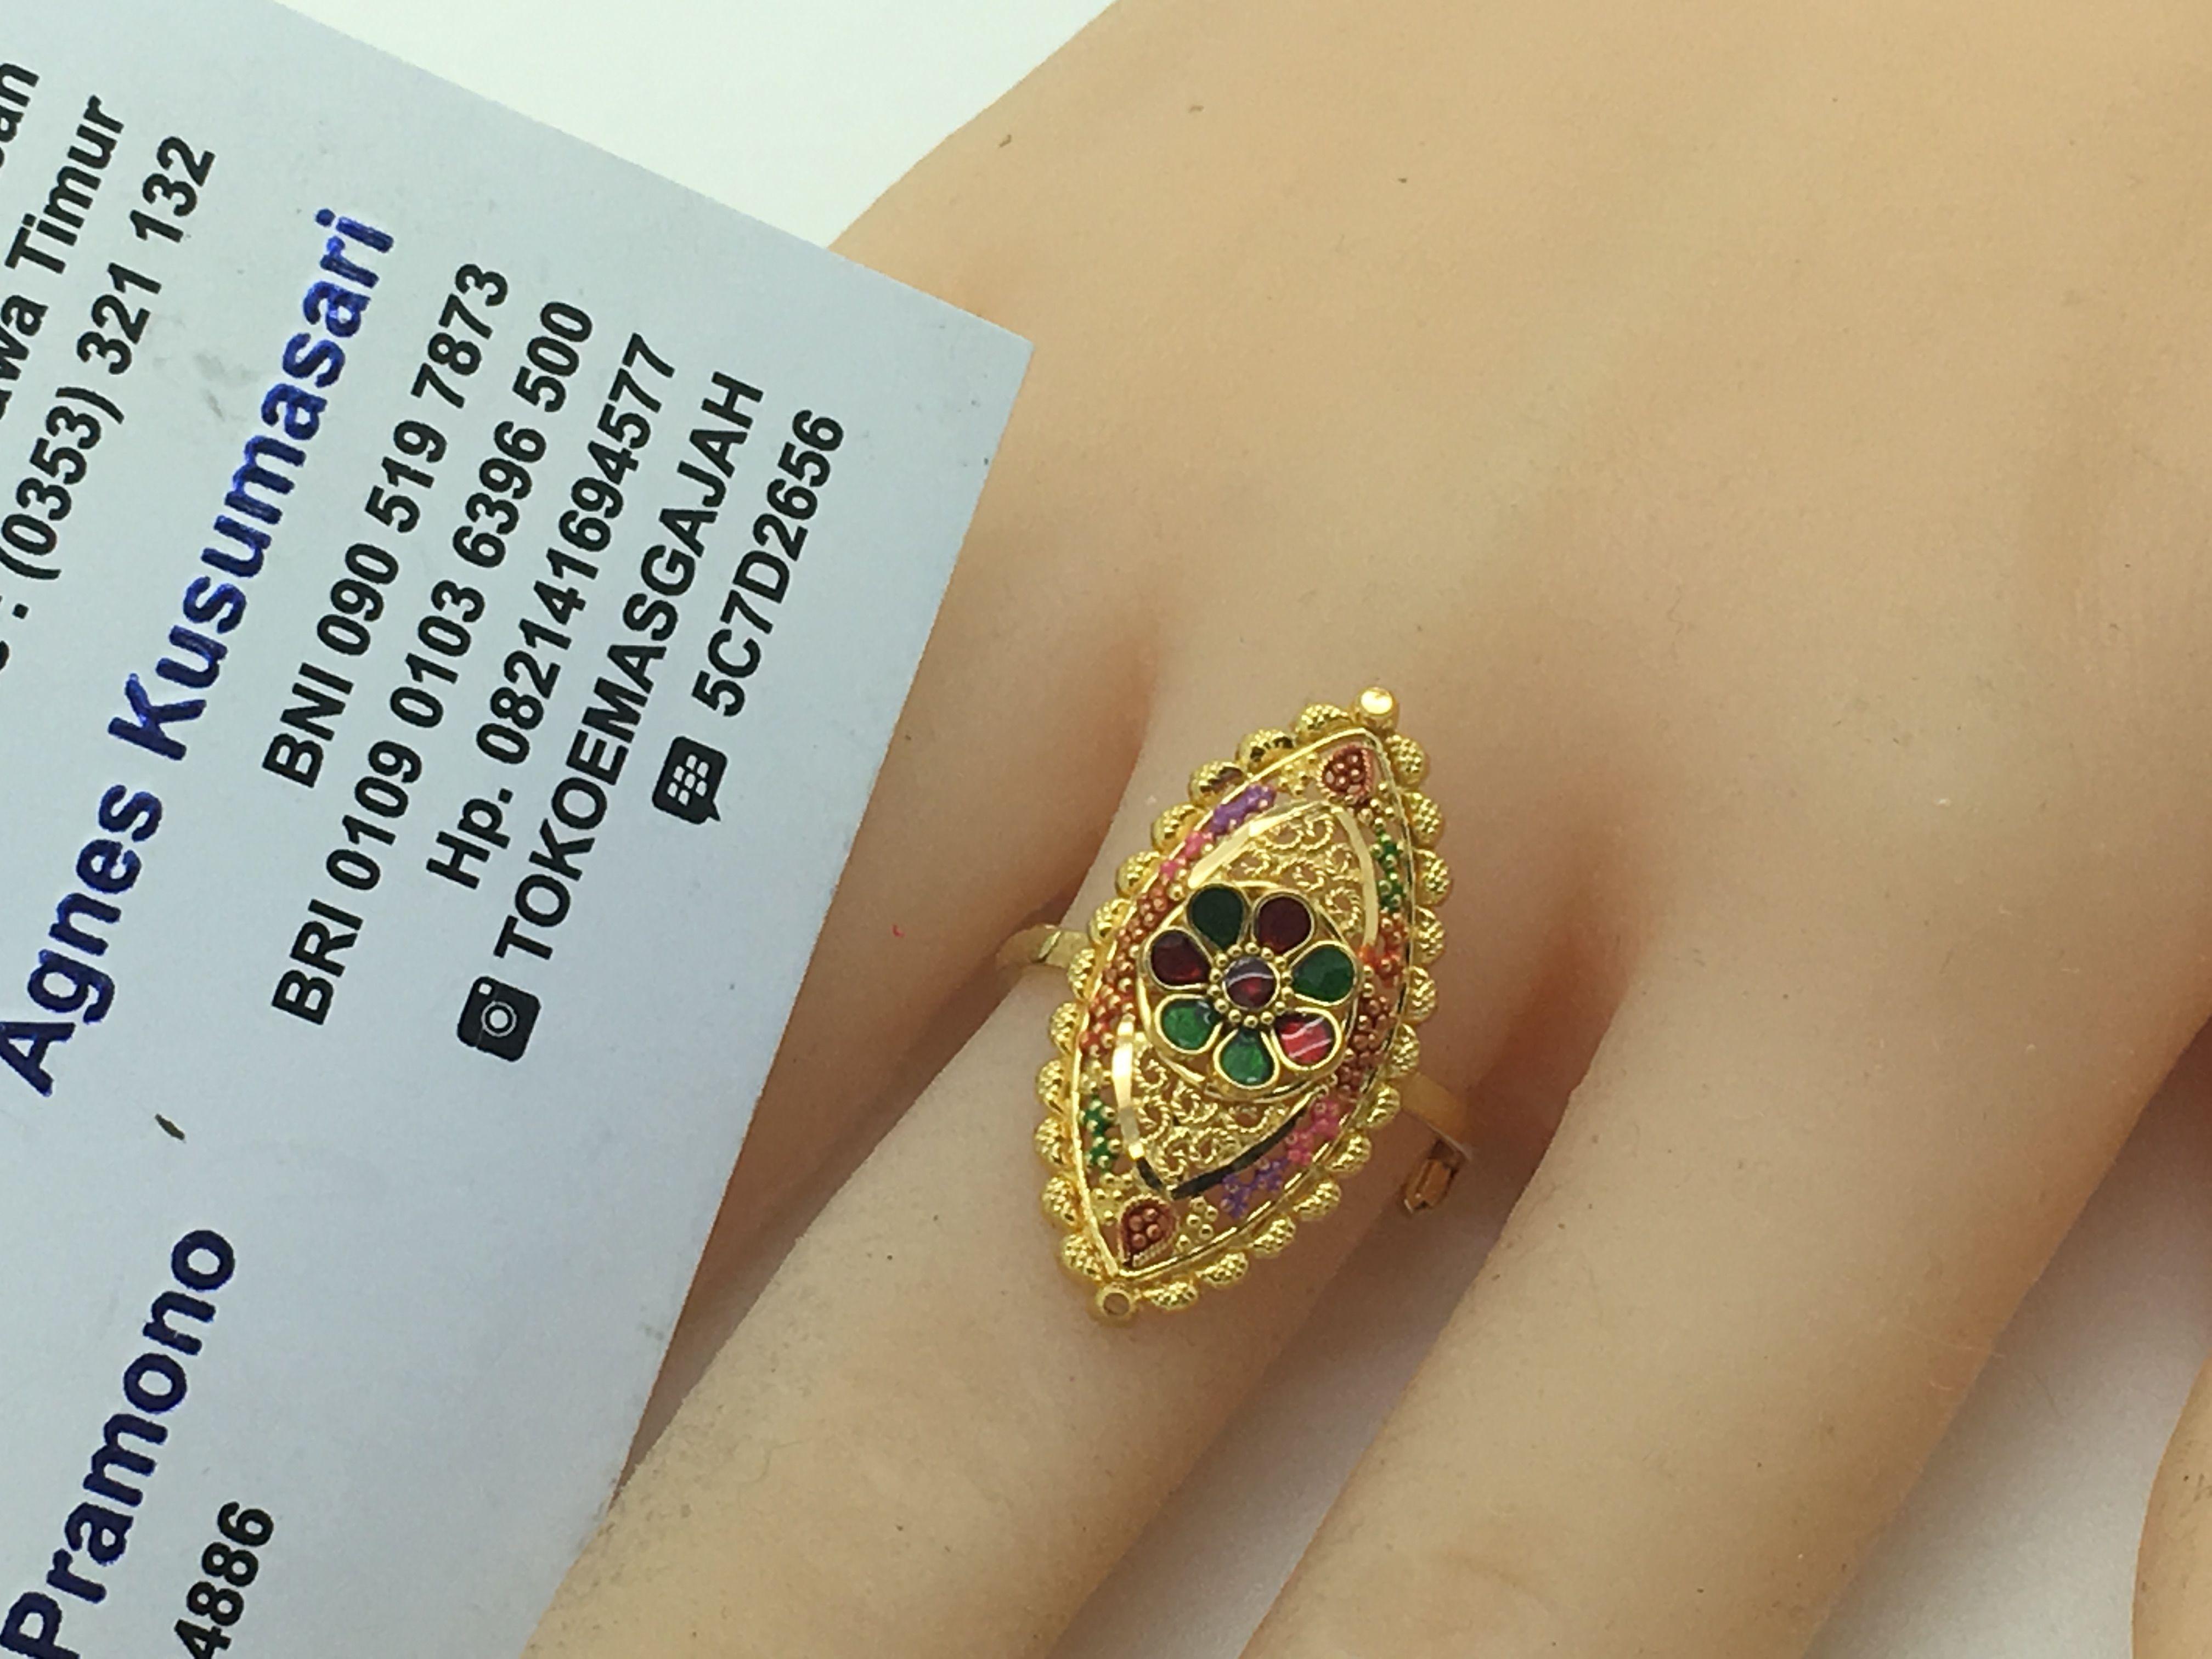 22k / 91,6% Gold Dubai / India Diamond Shape Ring size adjustable ...